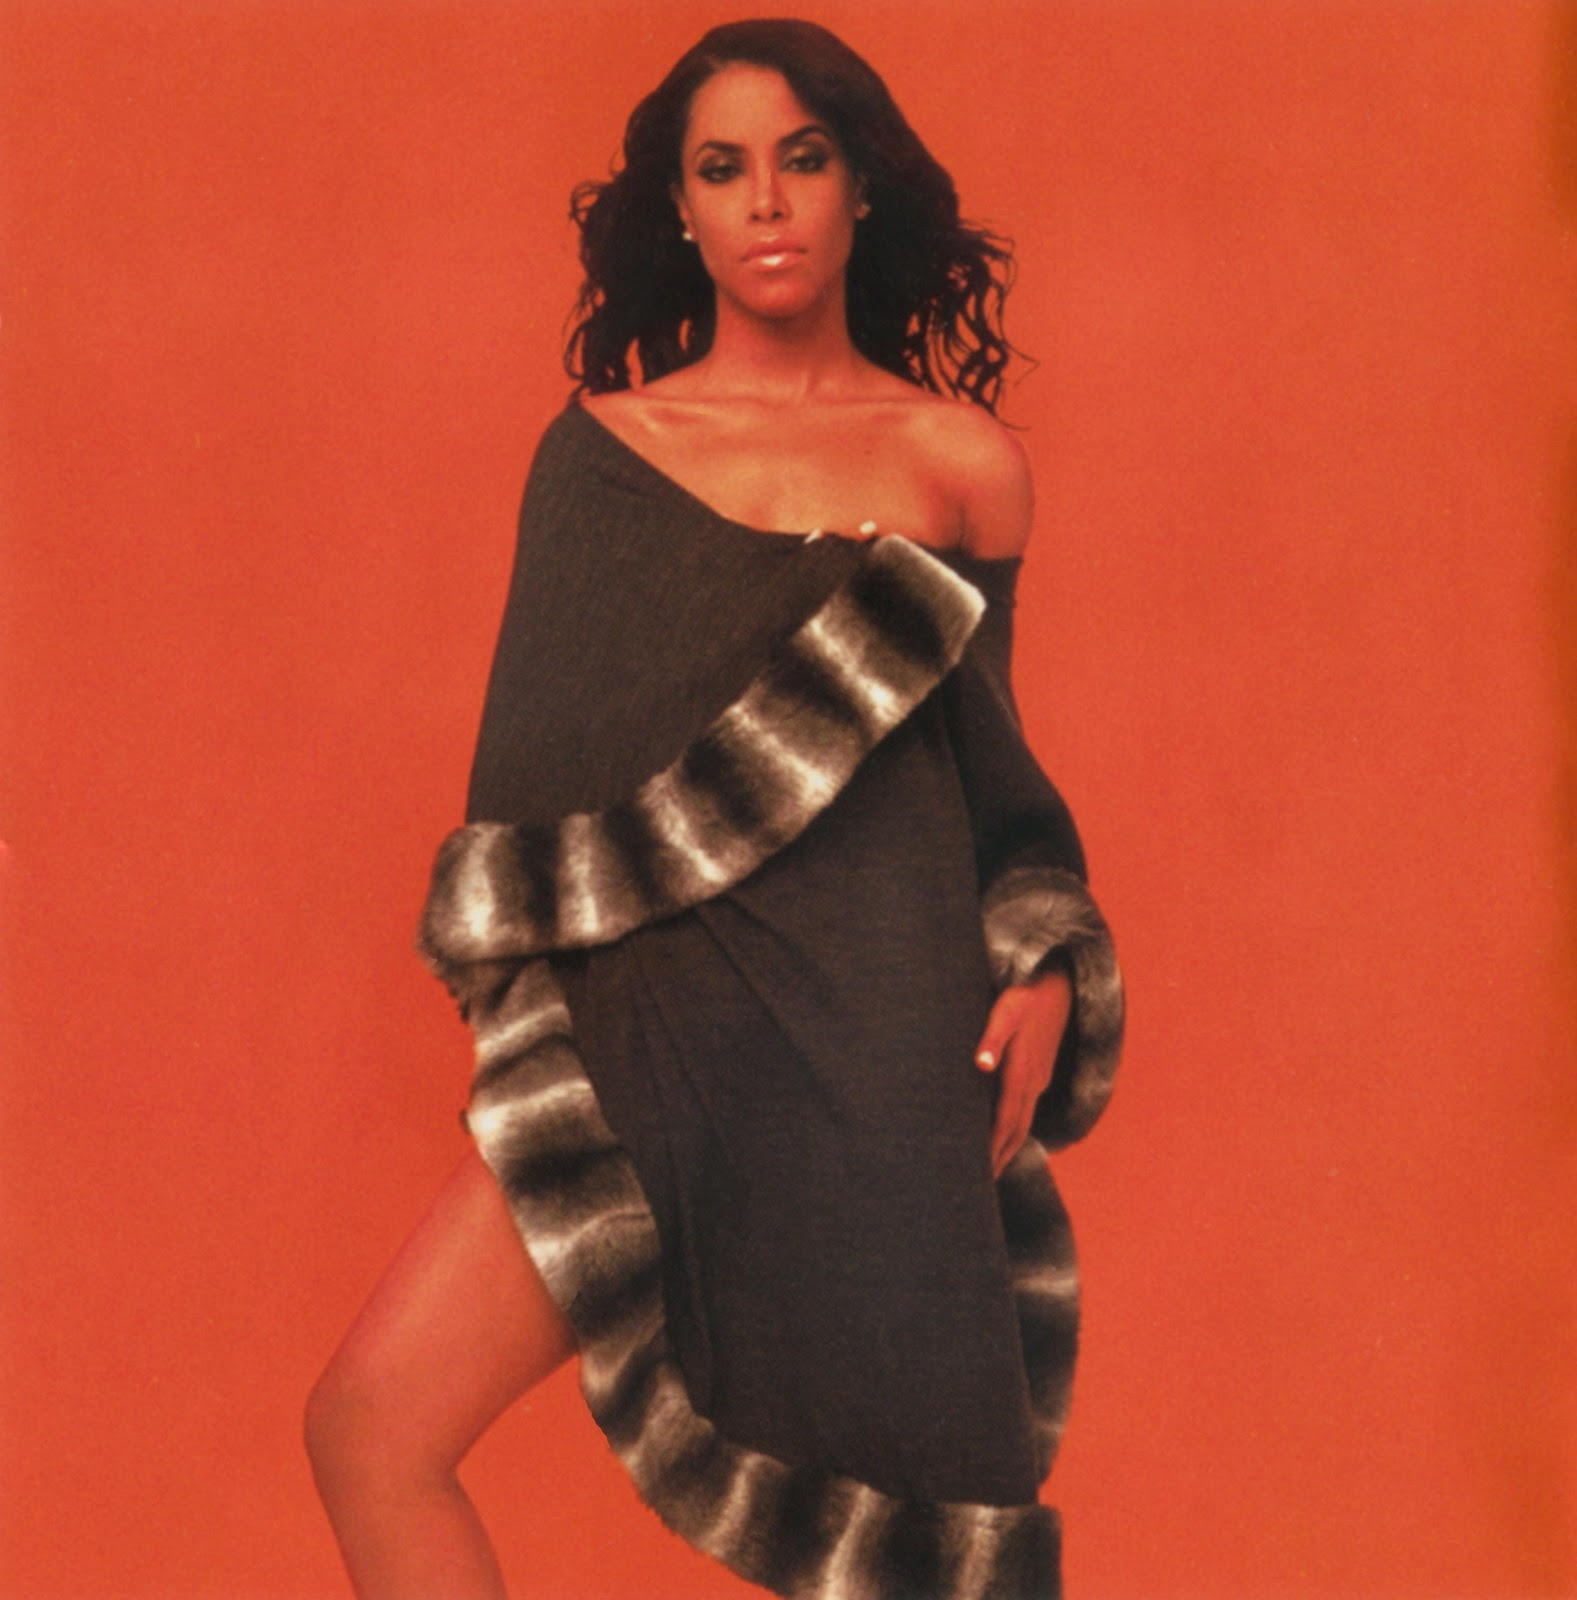 Aaliyah 2001 Album Cover Aaliyah self-titled albumI